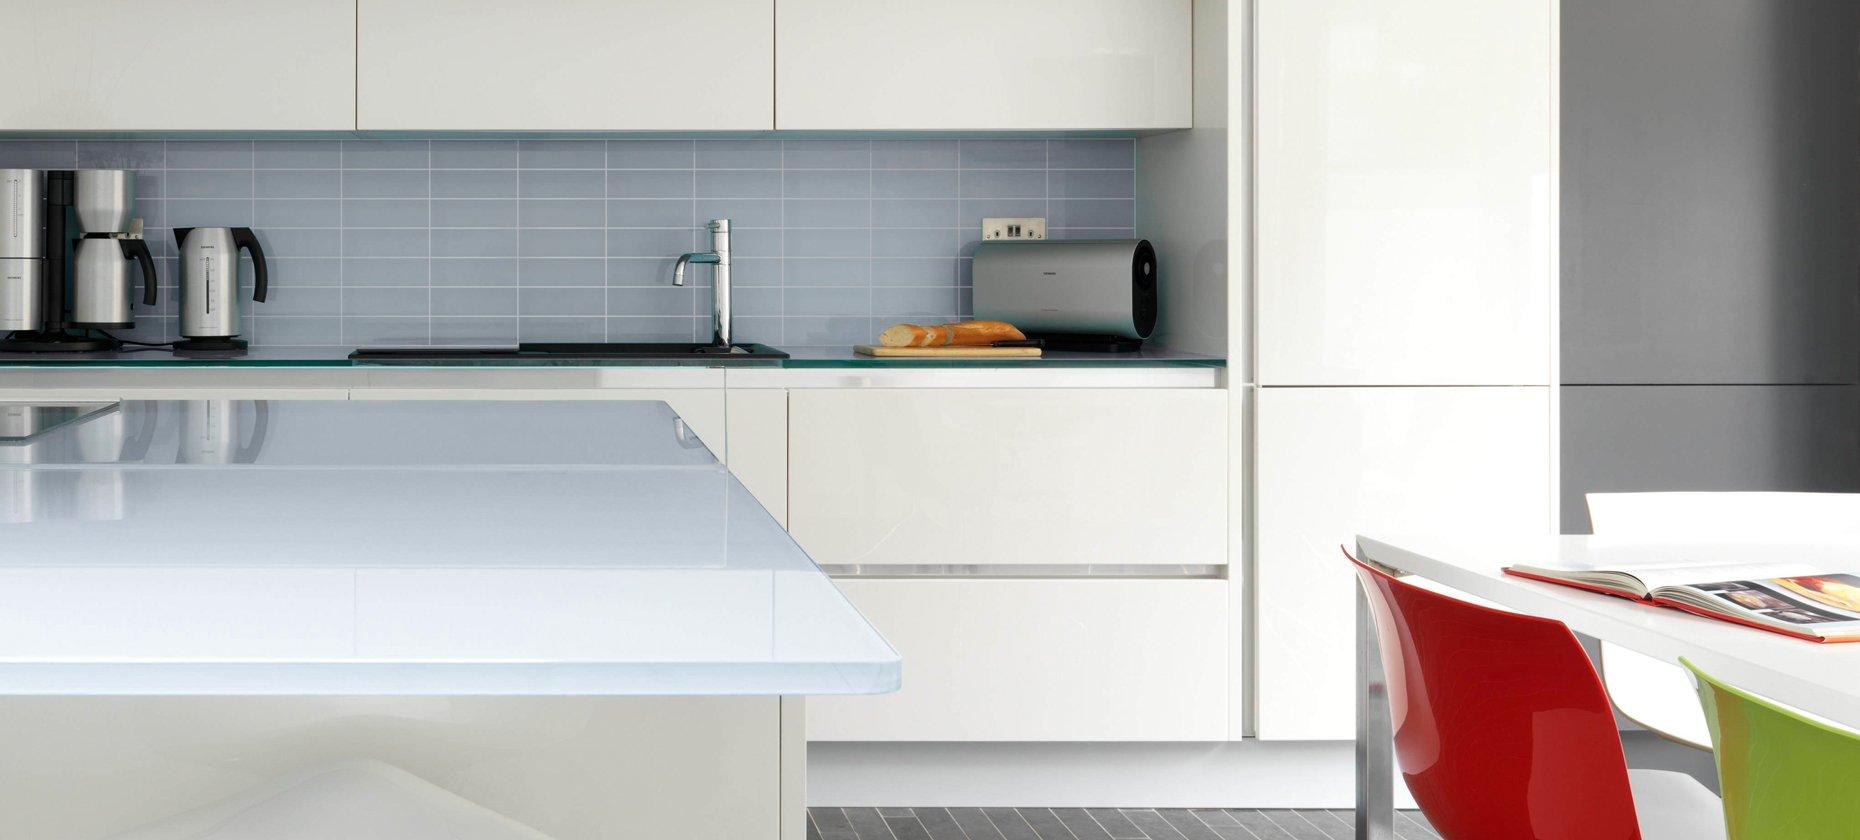 Warminster Tile Company | Garden State Tile